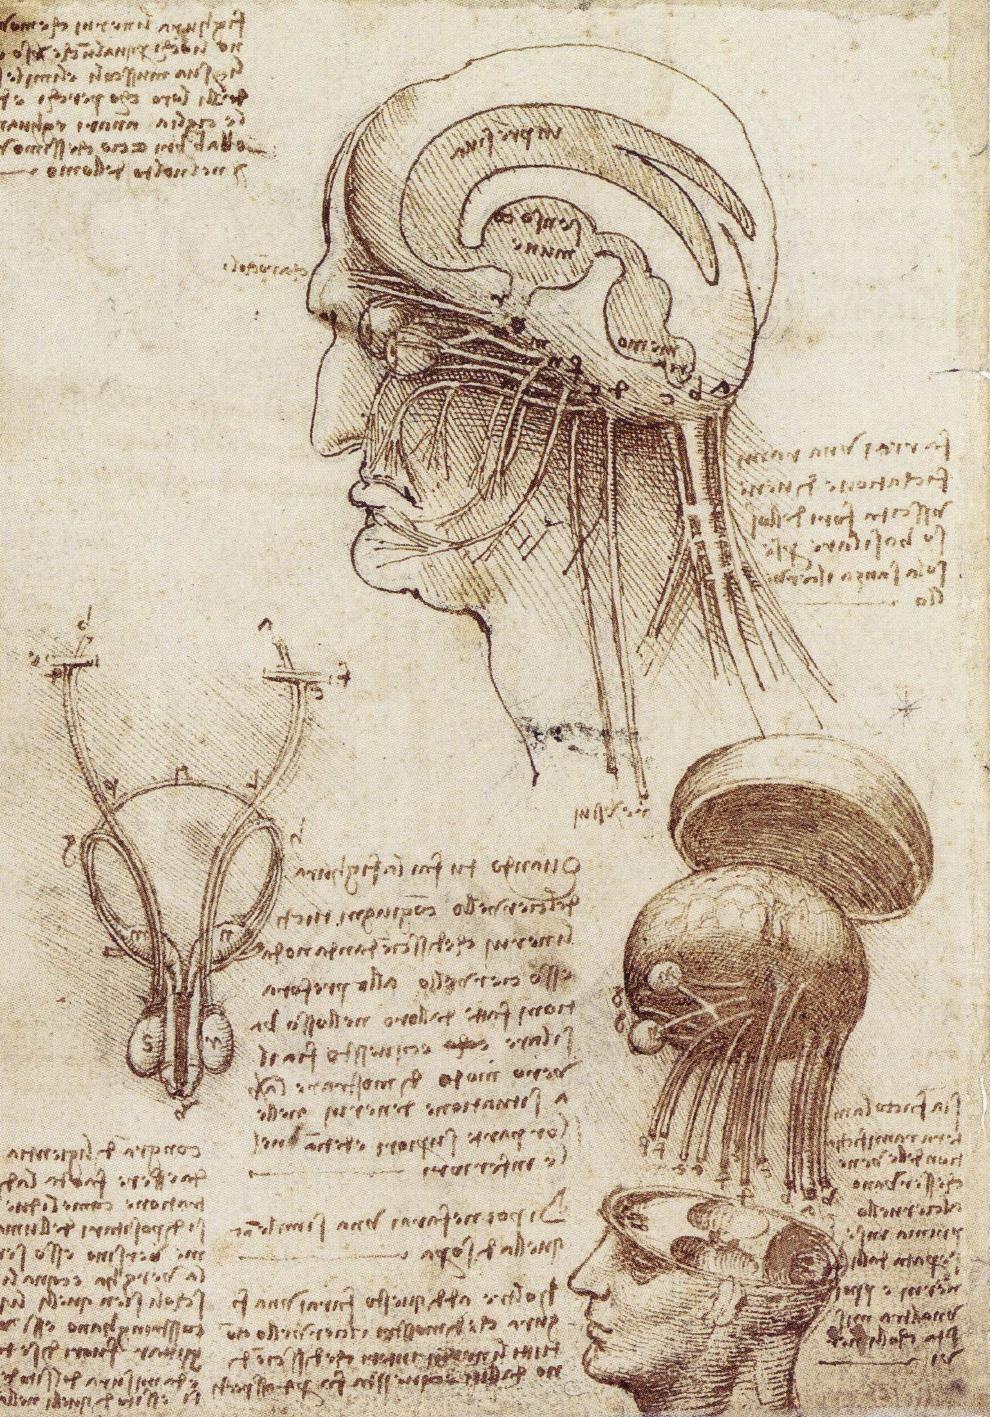 Dessin leonard de vinci brainphysiology 08 56 dessins de leonard de vinci histoire design art - Photo leonard de vinci ...